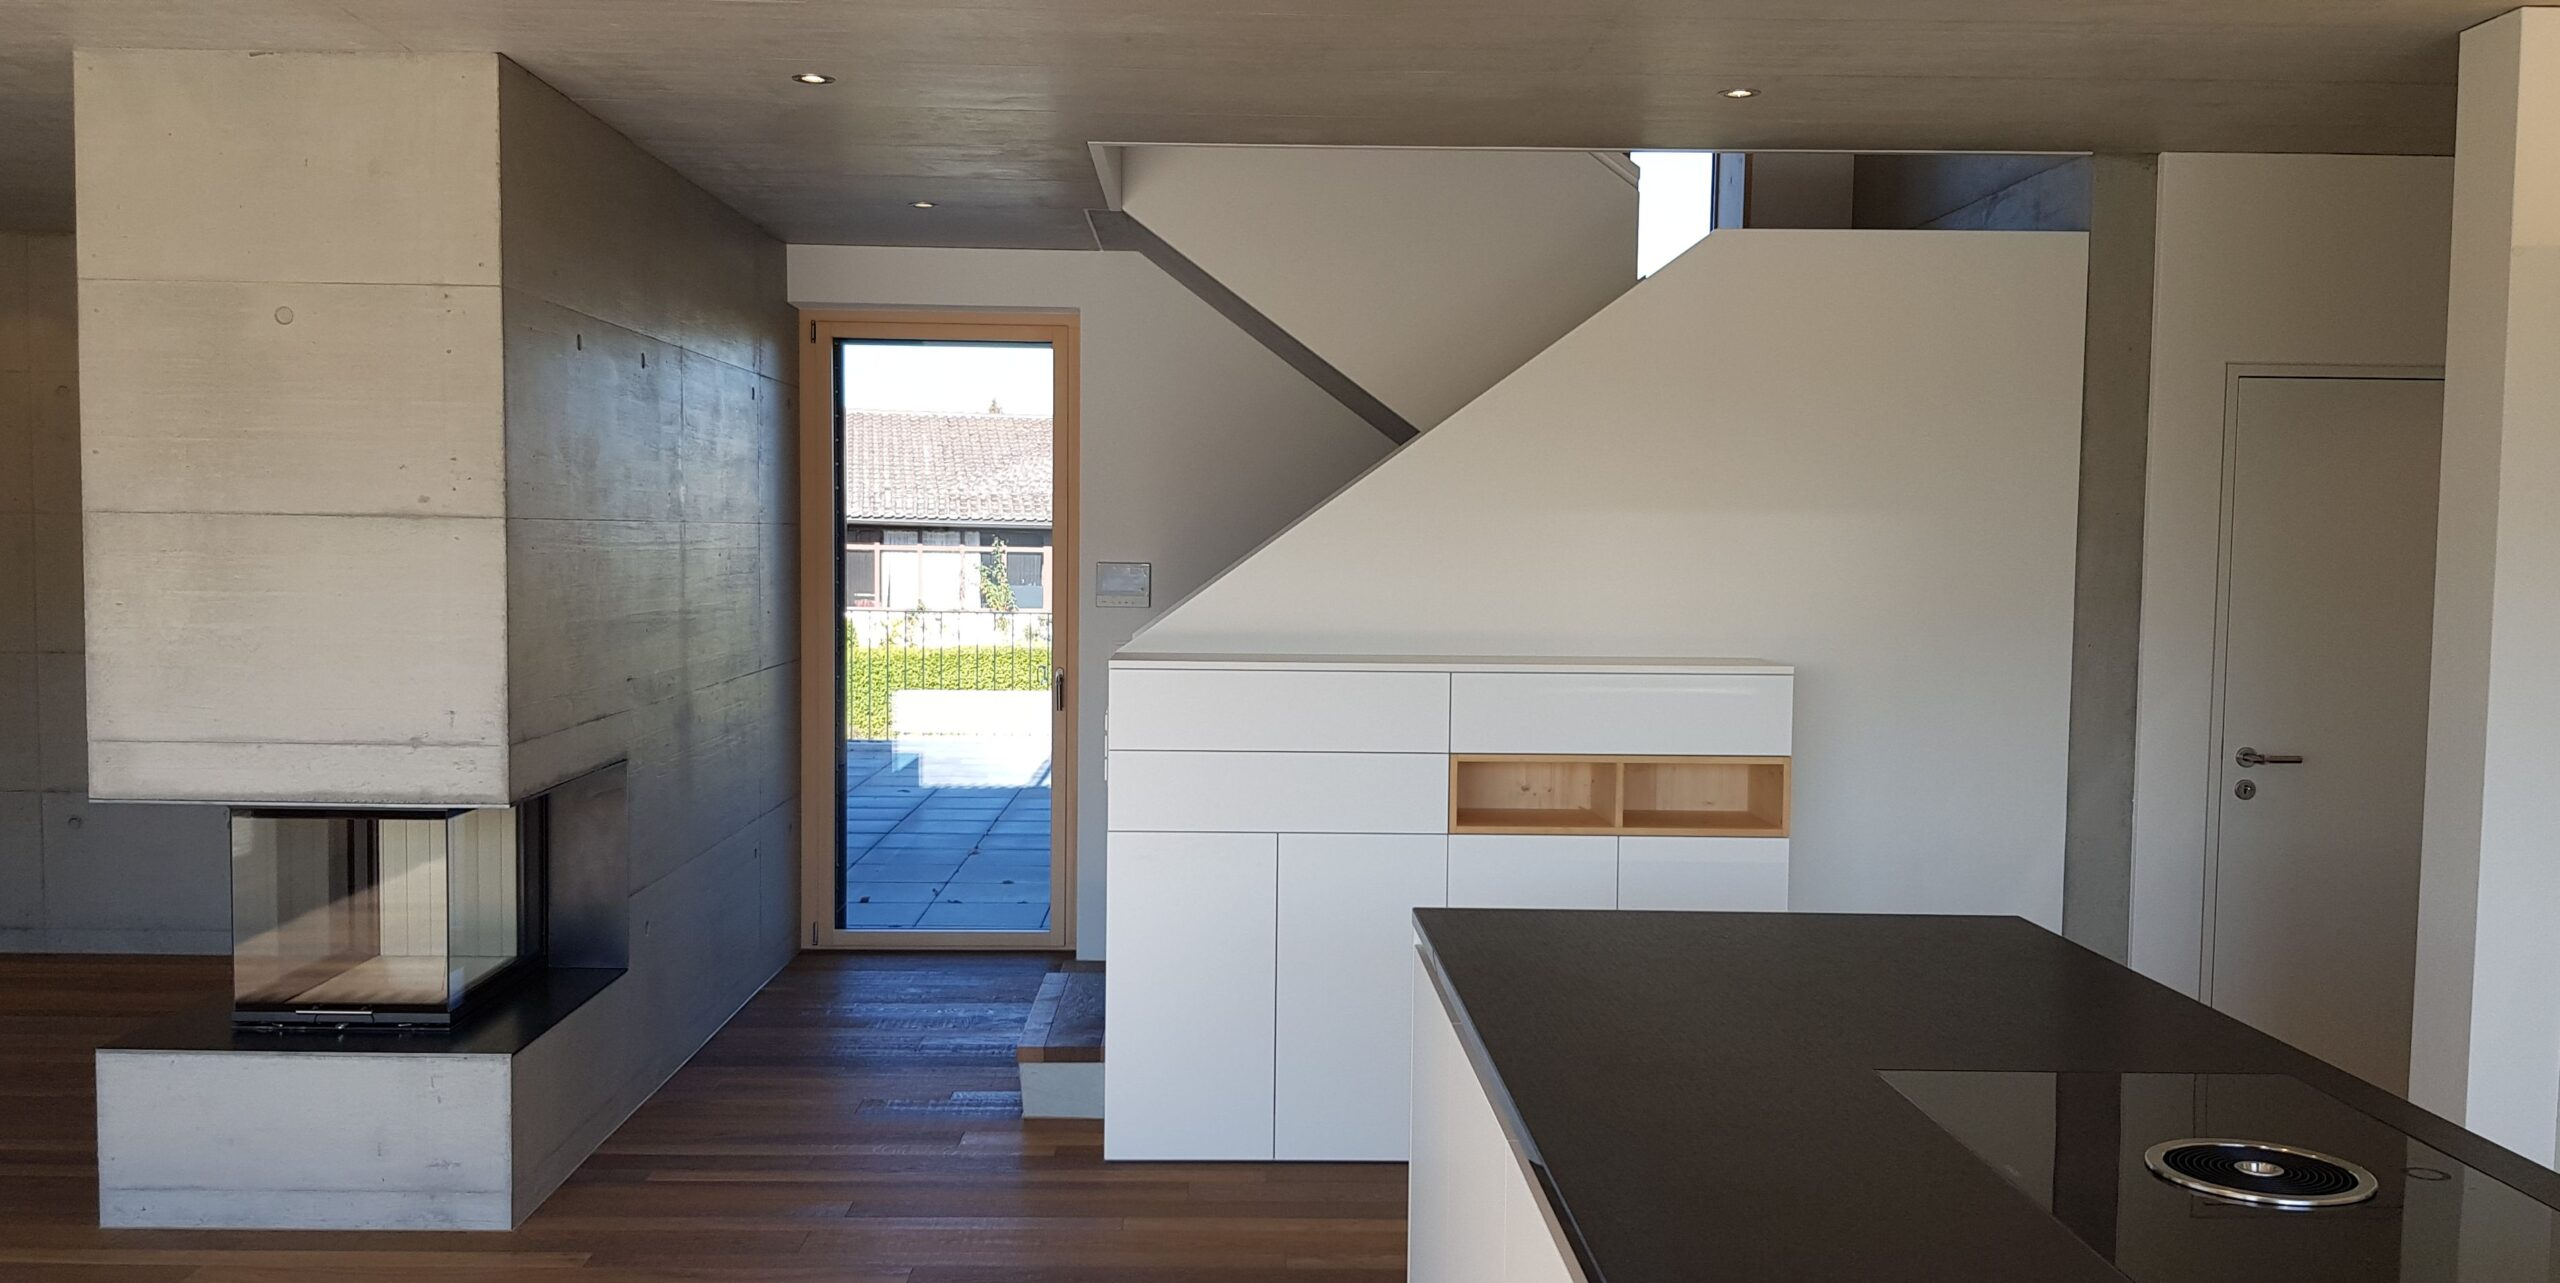 Wooddesign_Treppen_Teppengeländer weiss_Holztreppen_Treppenverkleidung_modern Eiche (4)-min